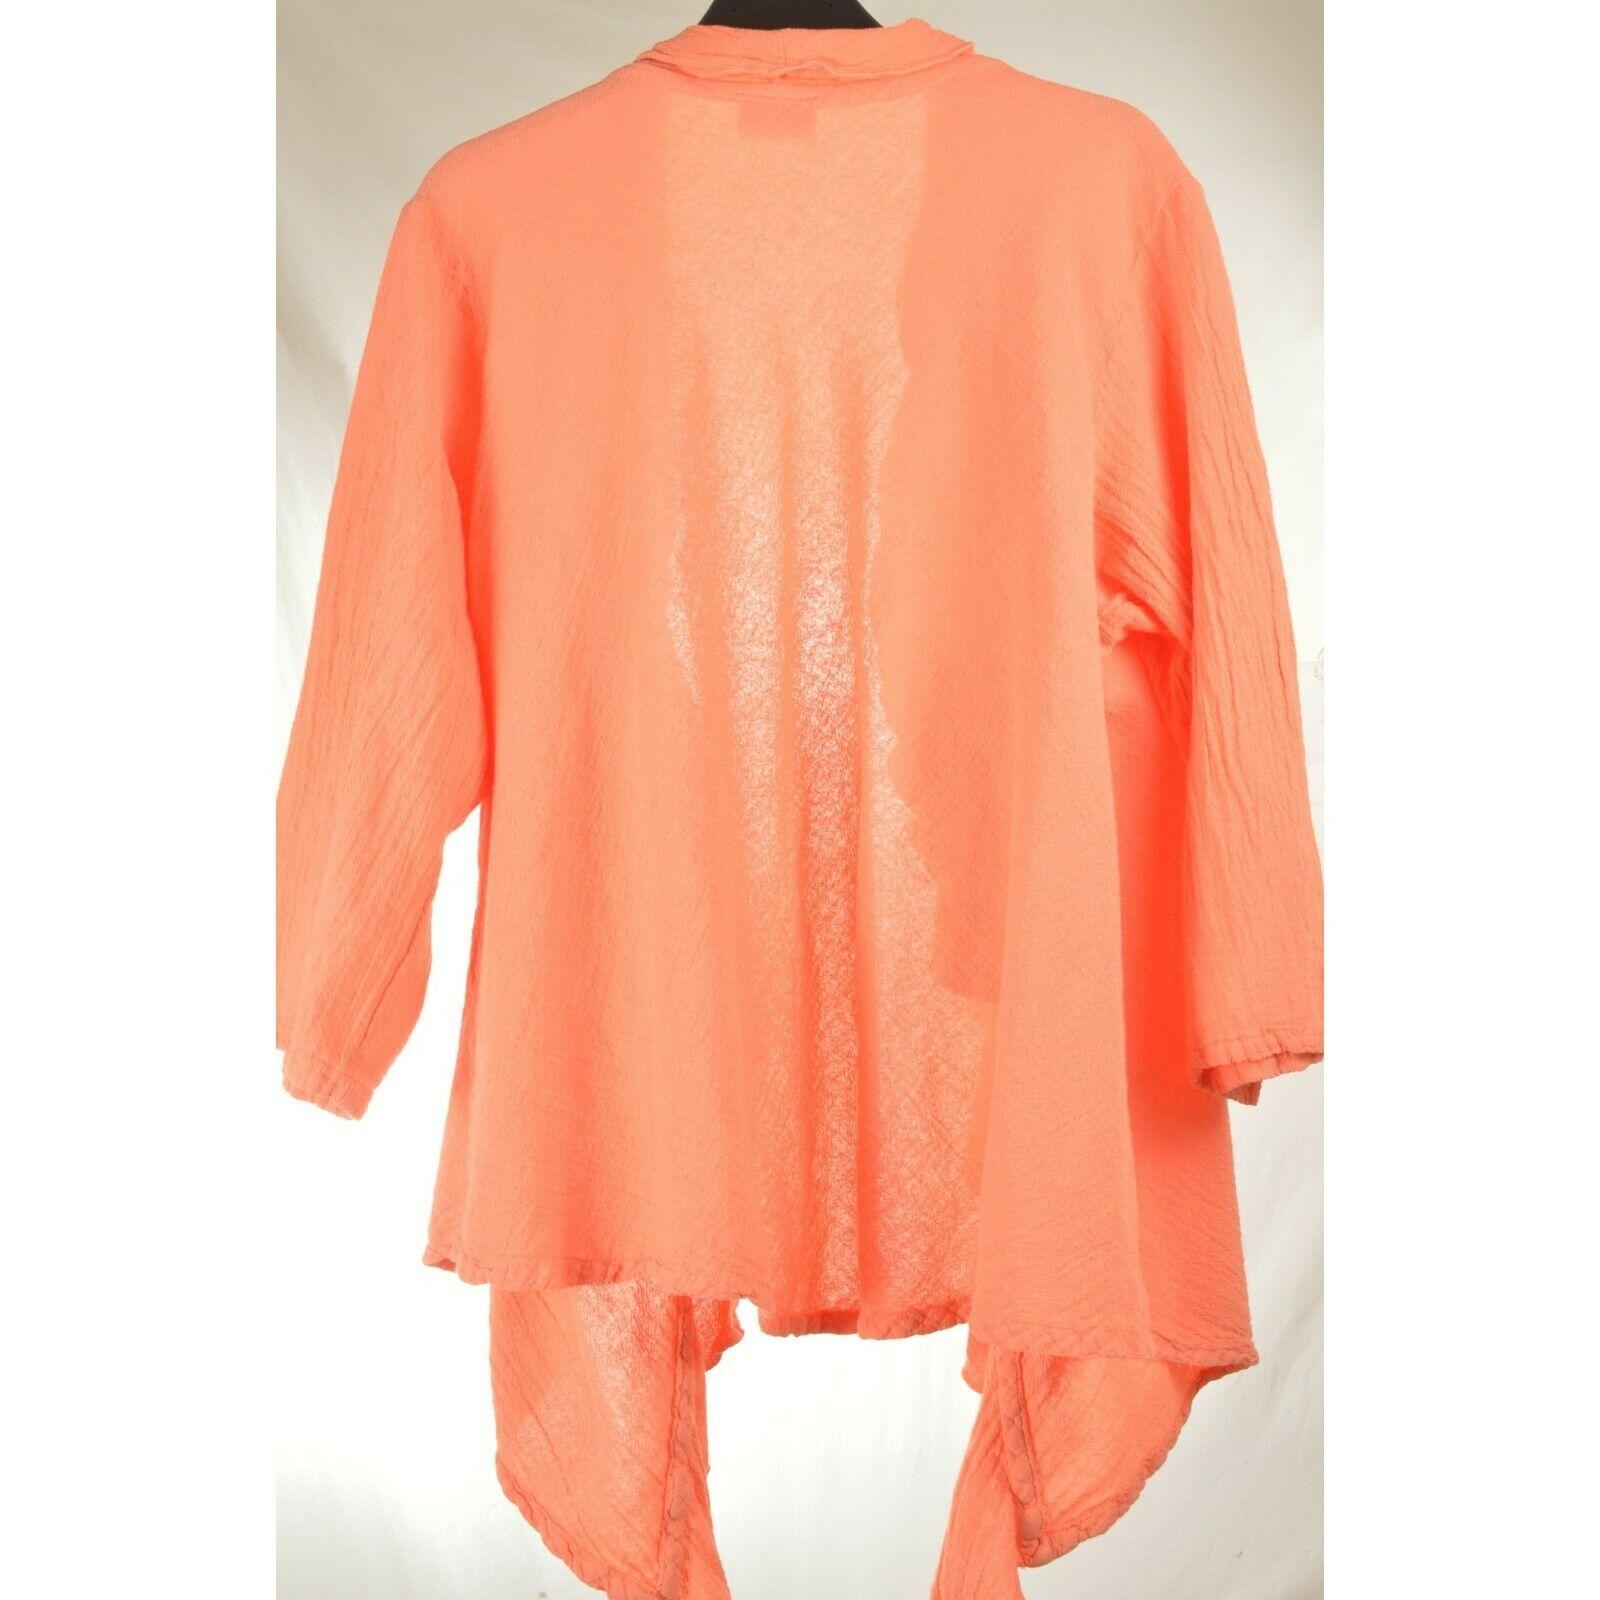 Oh My Gauge jacket cover open OS orange sherbet long sleeve ruffle front hi lo image 5